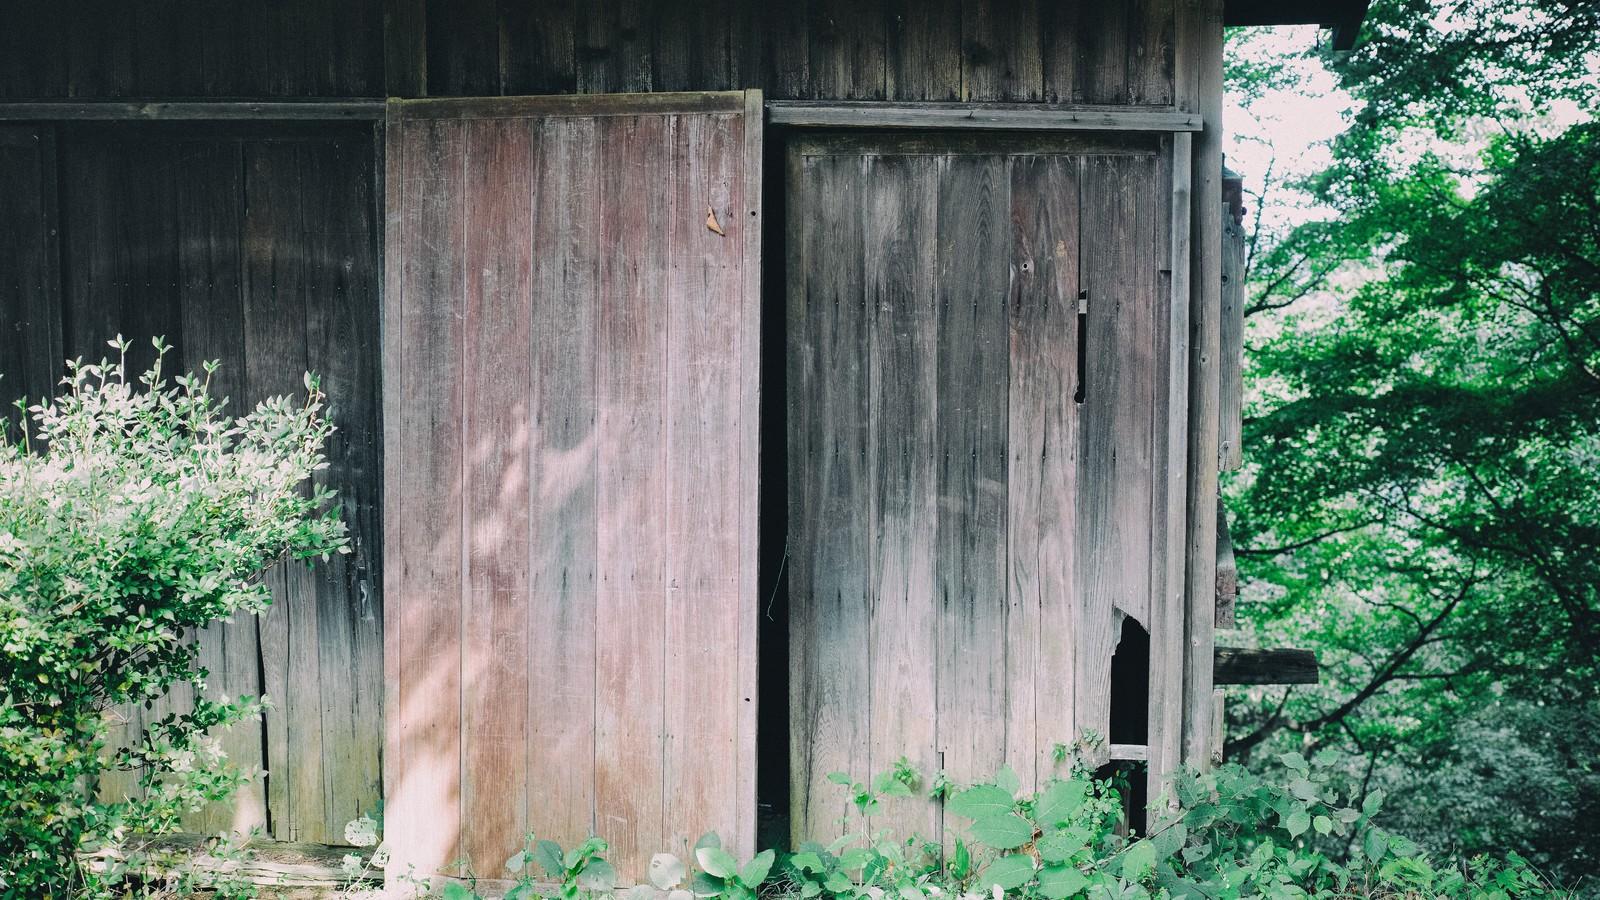 空き家対策特別措置法